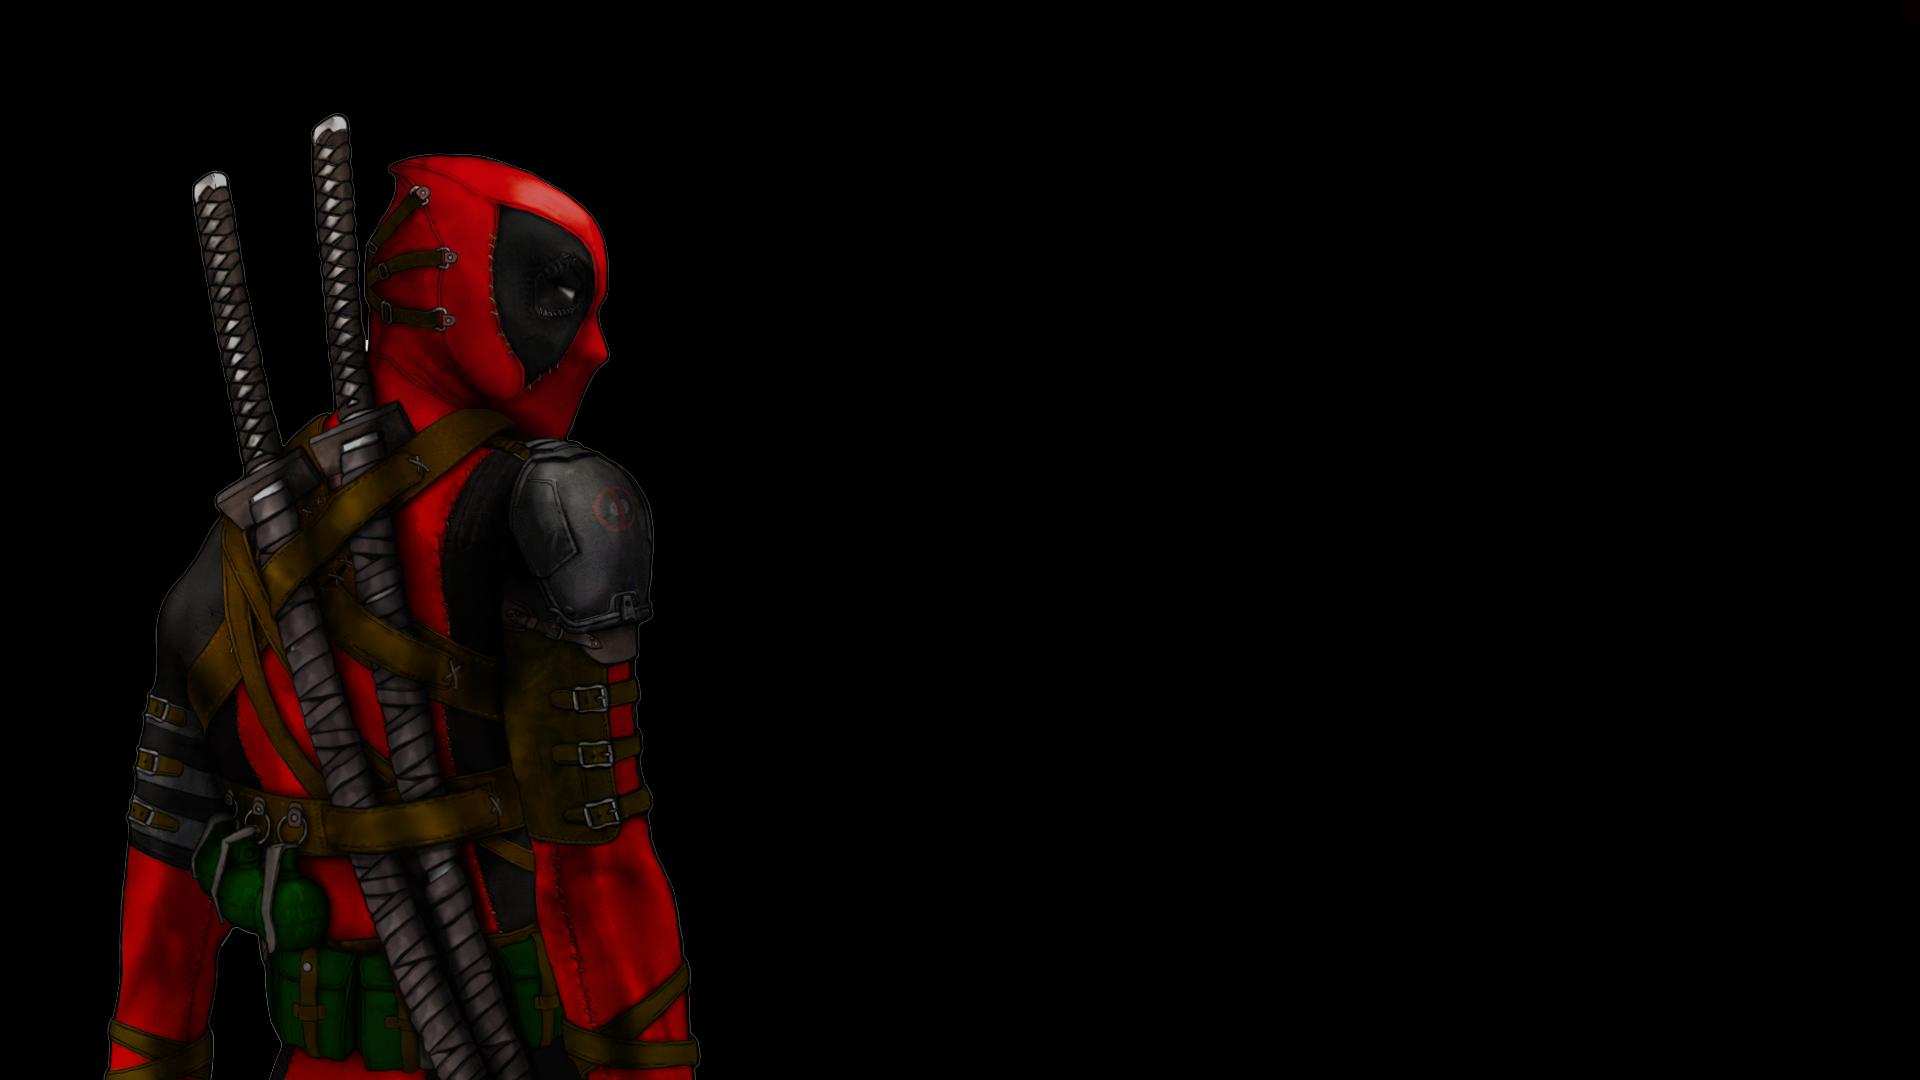 Deadpool With Katana Wallpapers HD 1920x1080